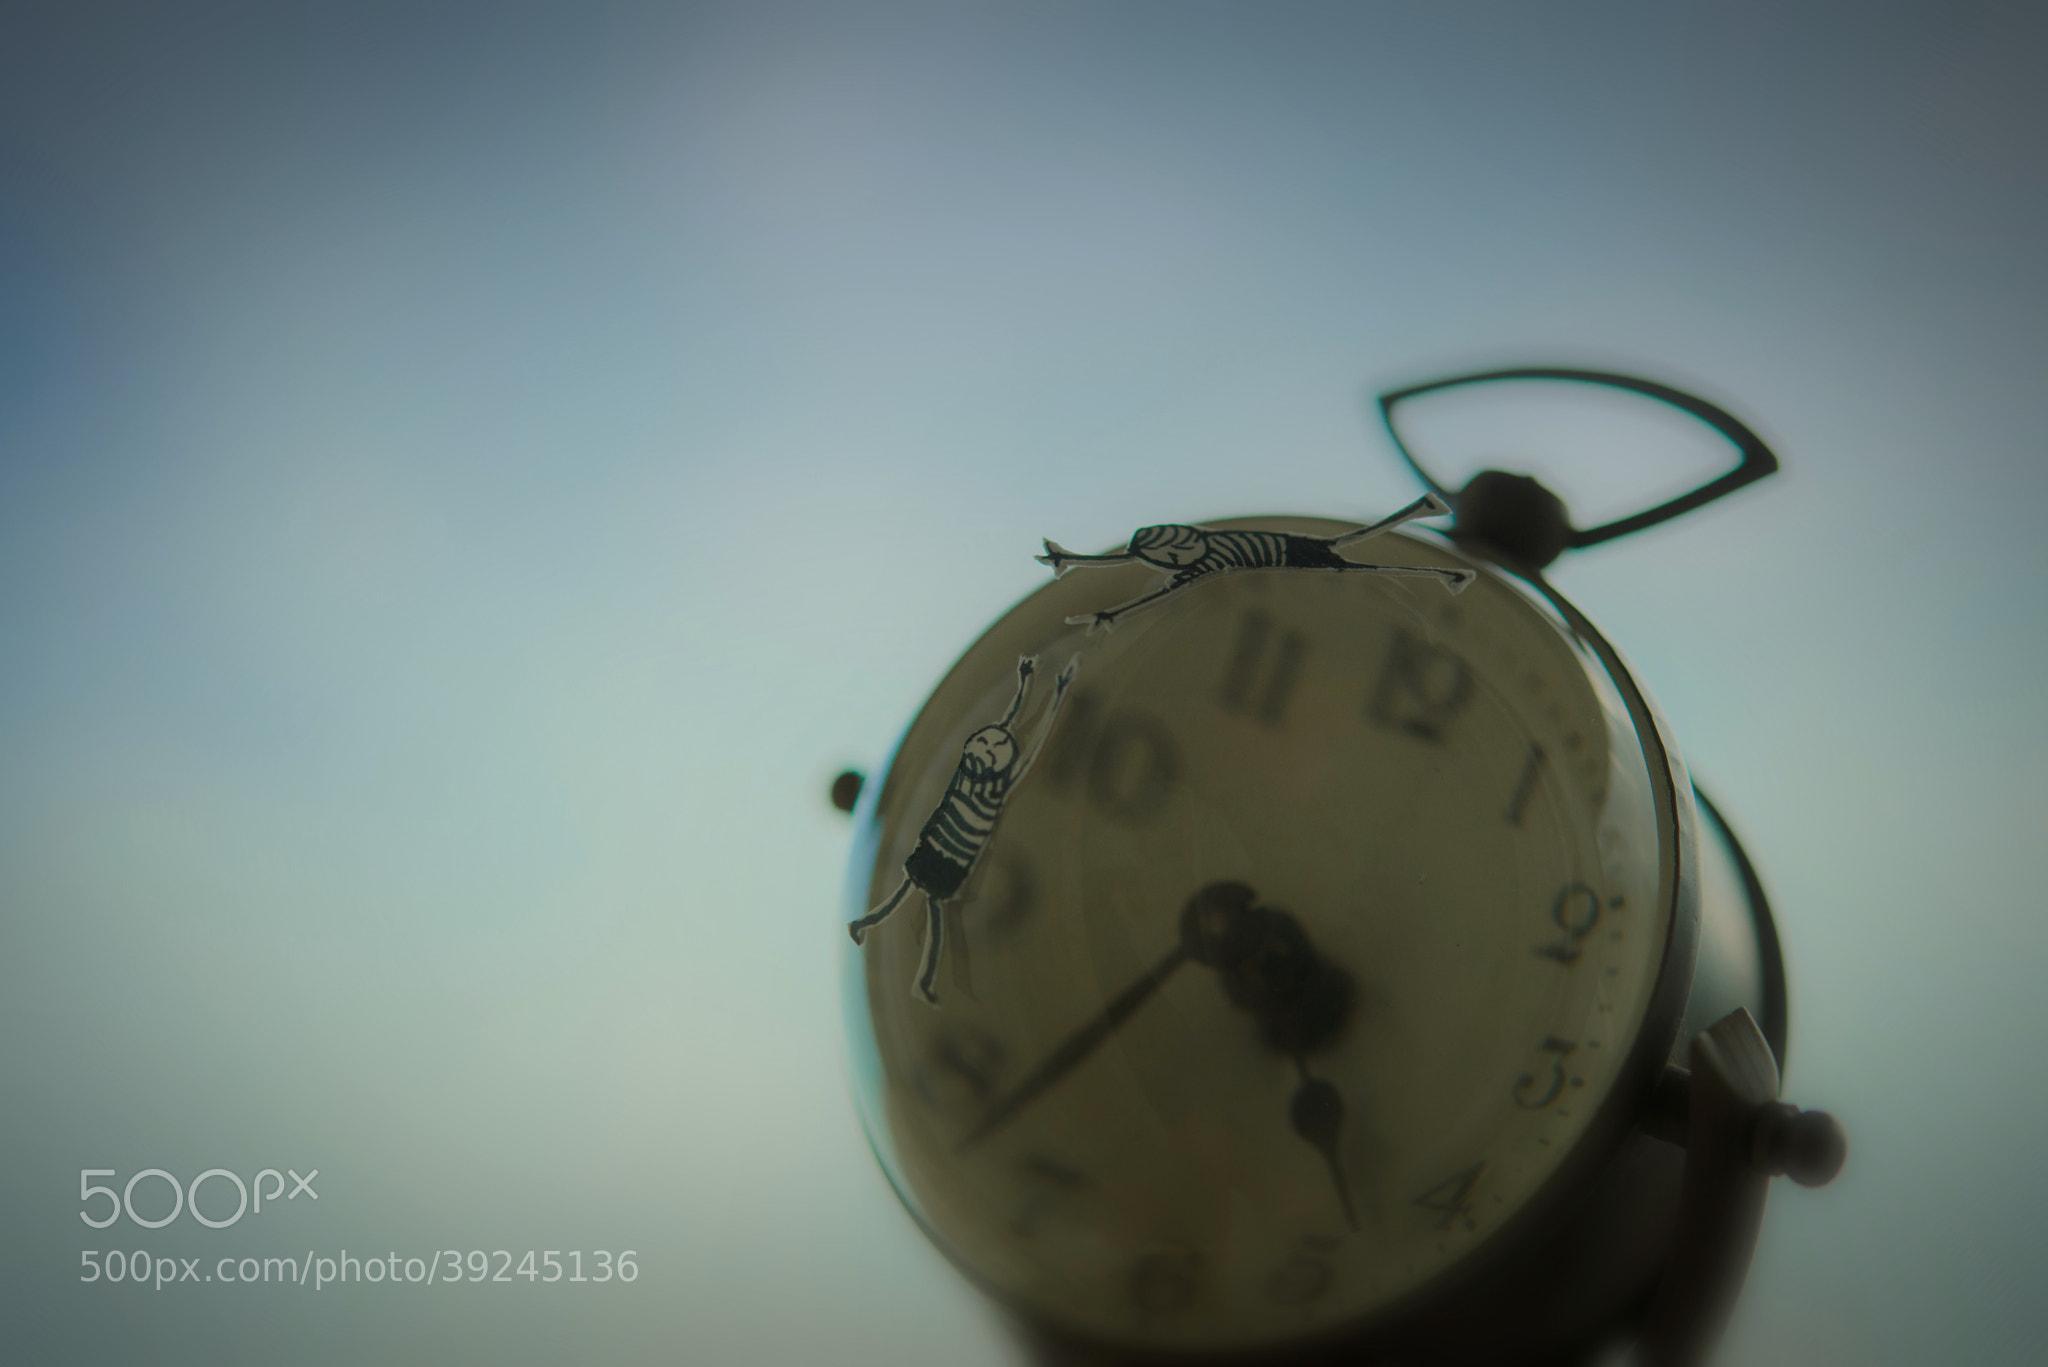 Photograph Hurry up! by Kouichi Chiba on 500px